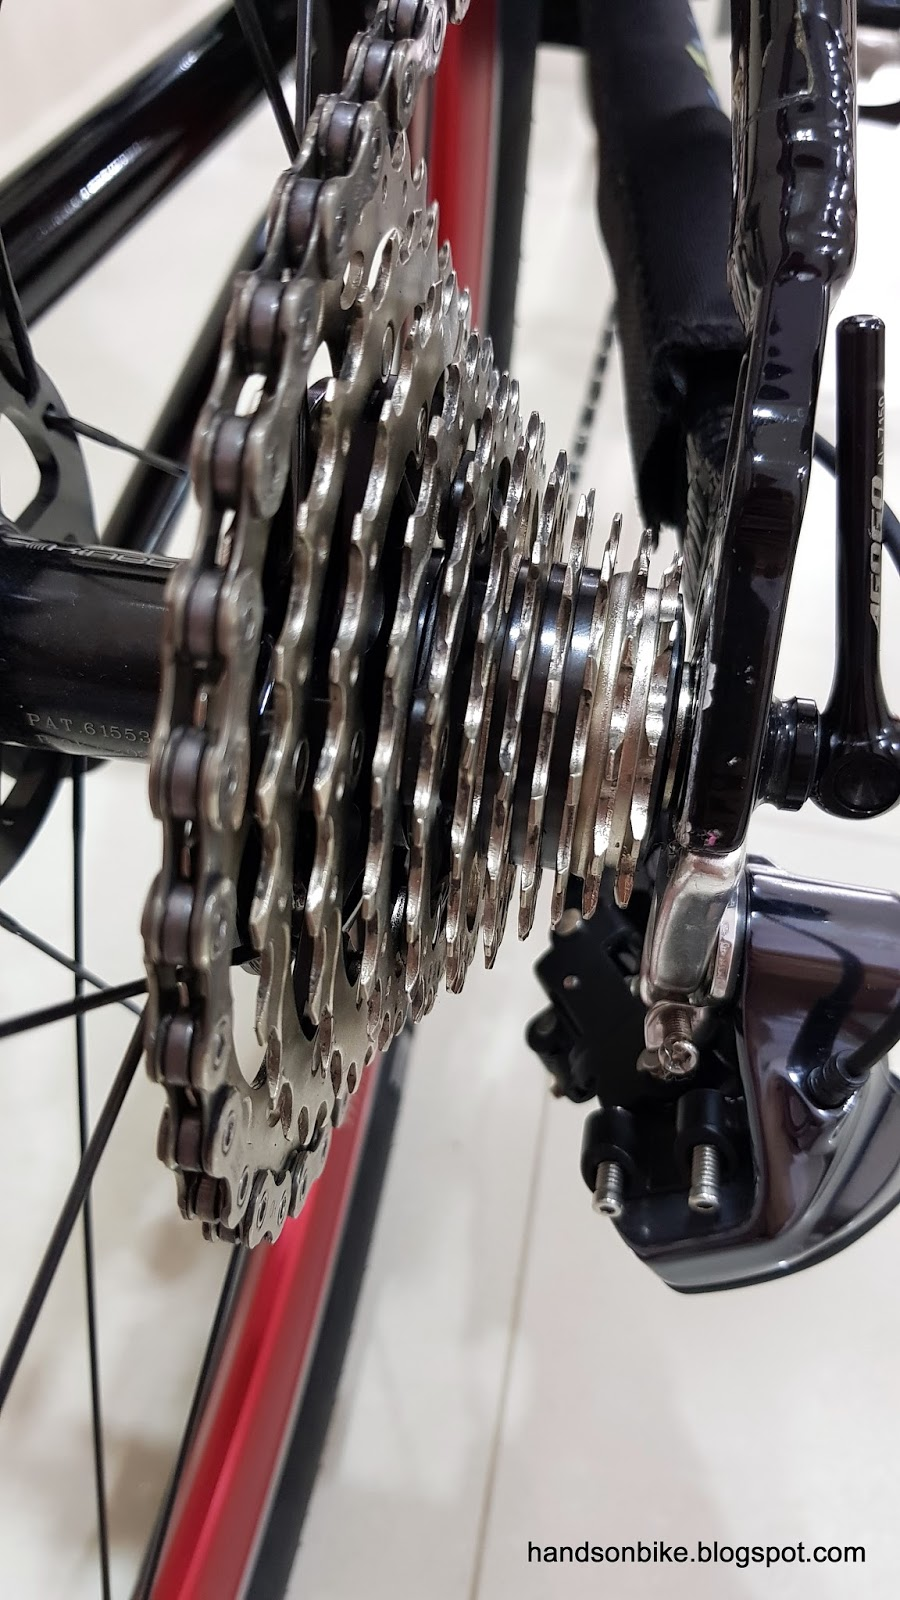 Hands On Bike Dahon Muex 1x11 Drivetrain Installation Mini Group Set 11speed Slx Sprocket 46t Ultegra 6800 11 32t Speed Cassette Installed